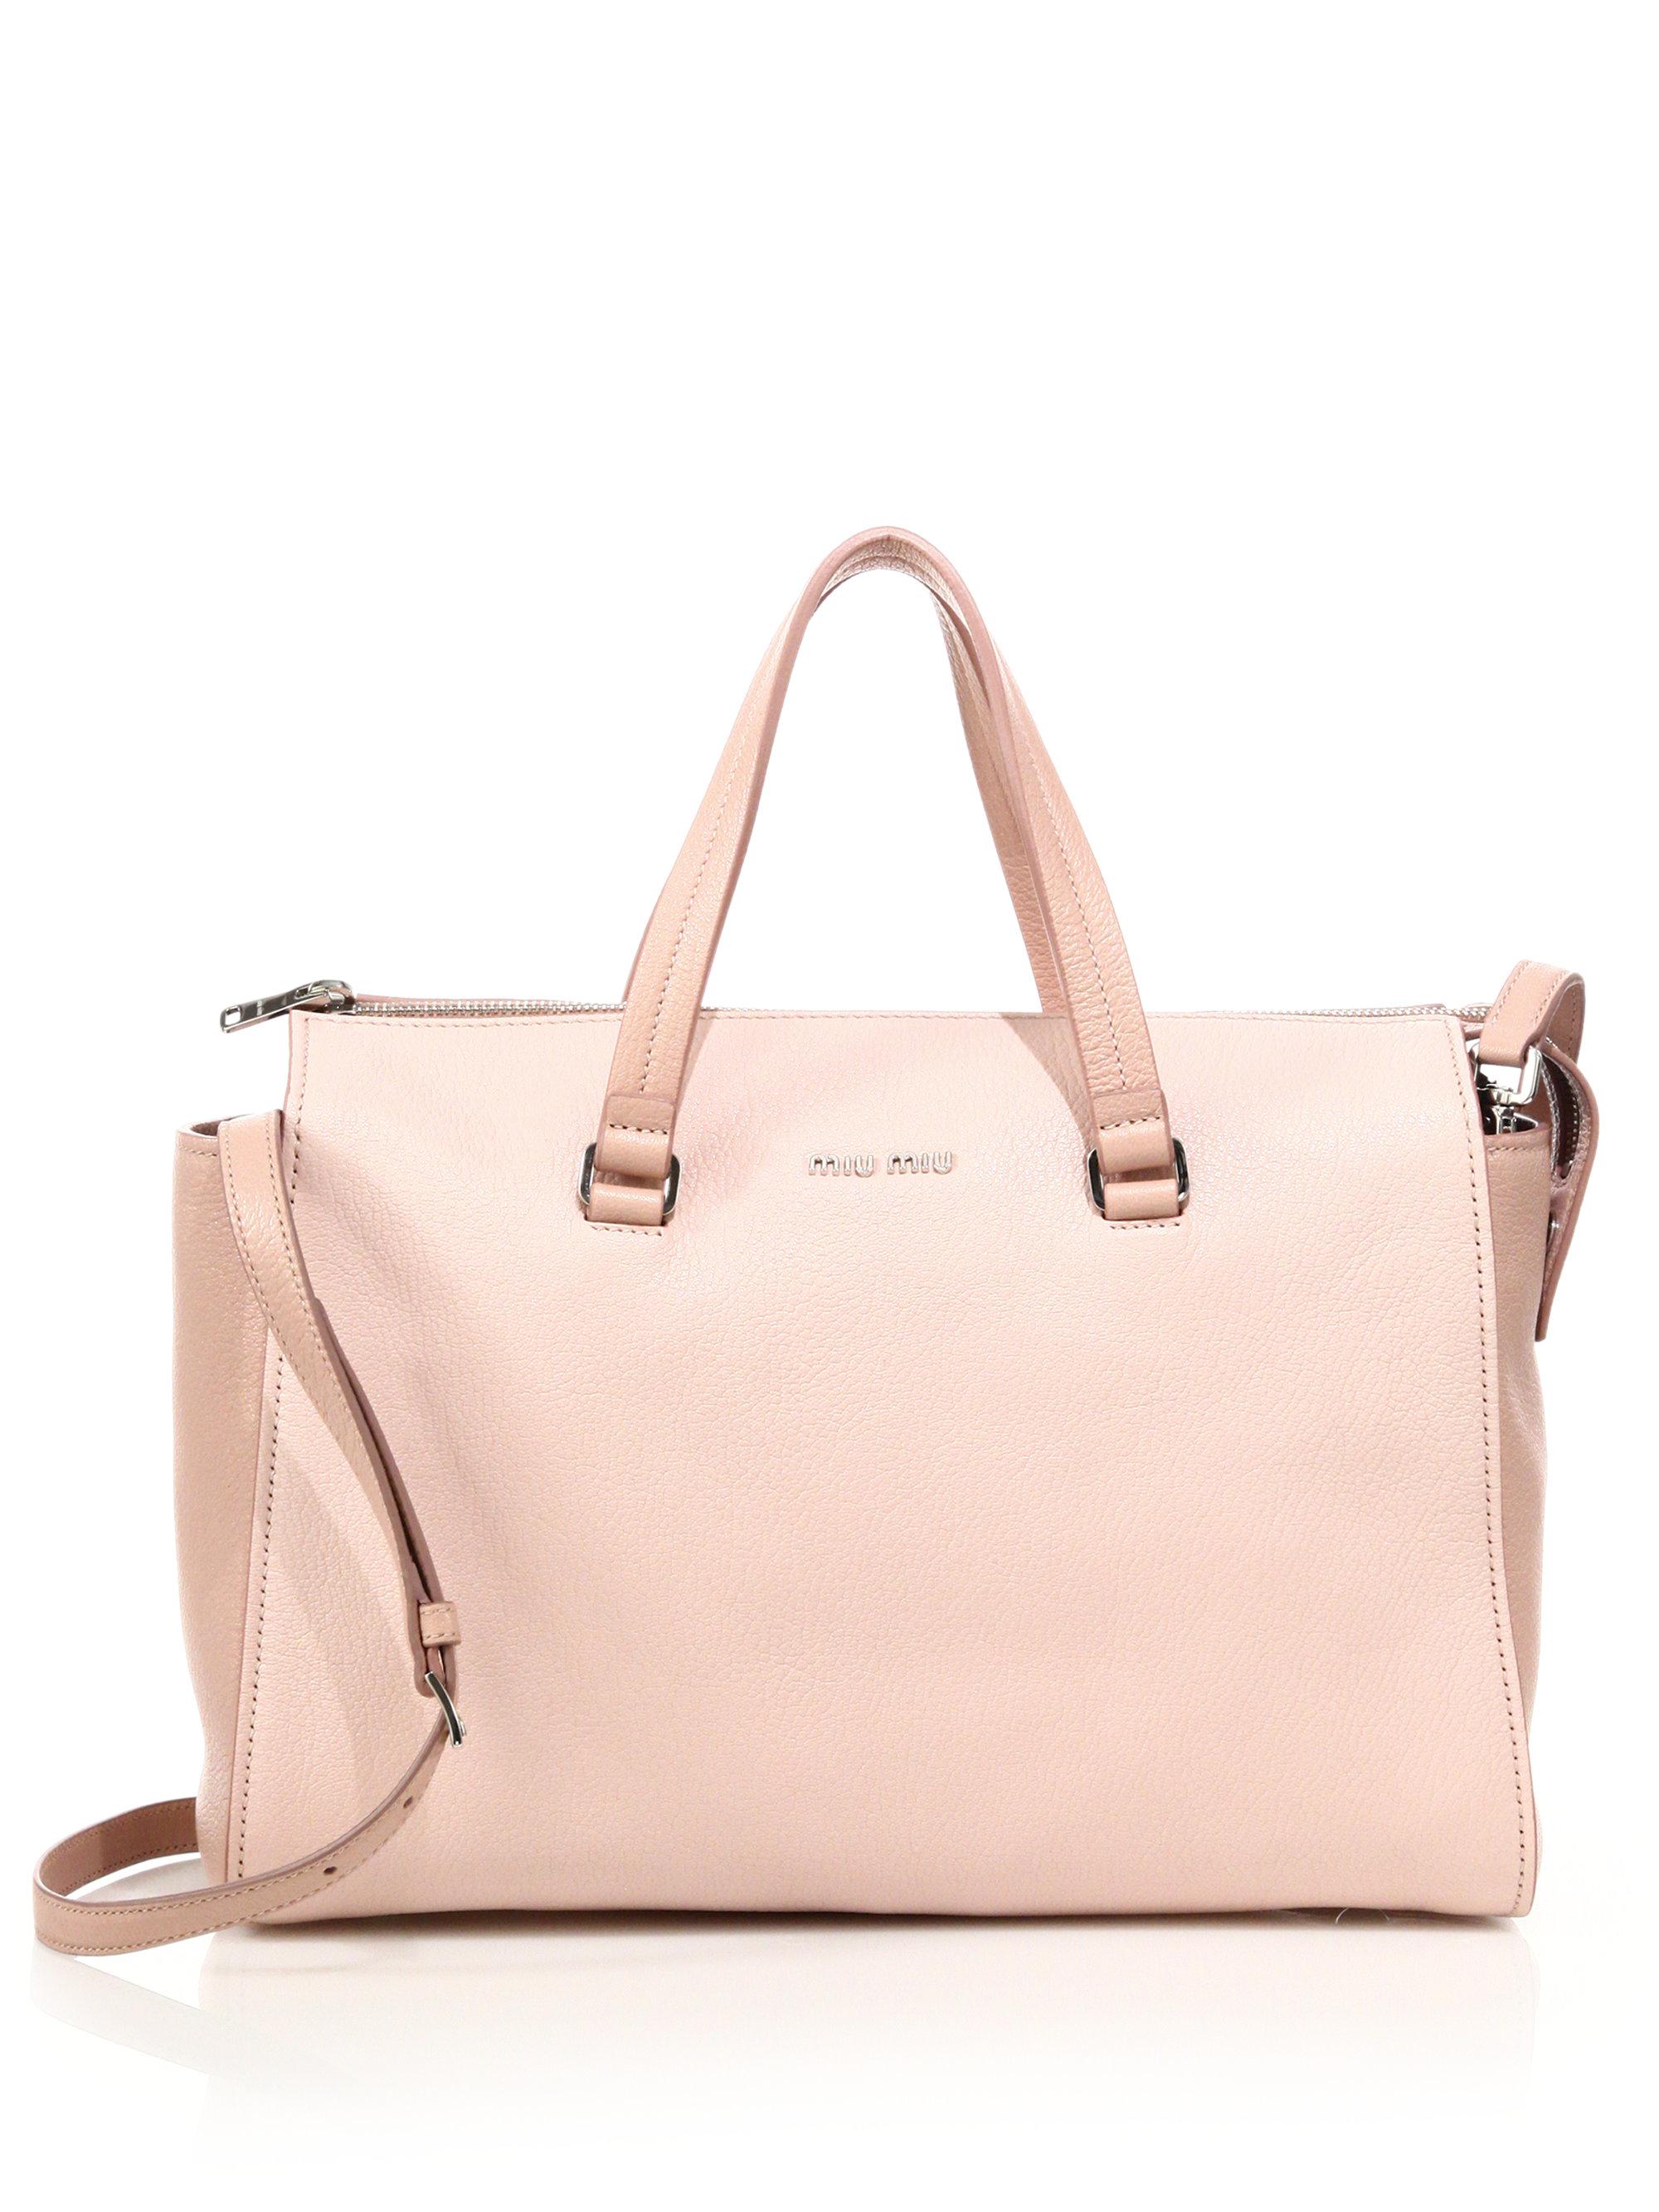 739f4db0616a Top Lyst - Miu Miu Madras Two-tone Leather Zip Satchel in Pink IE03